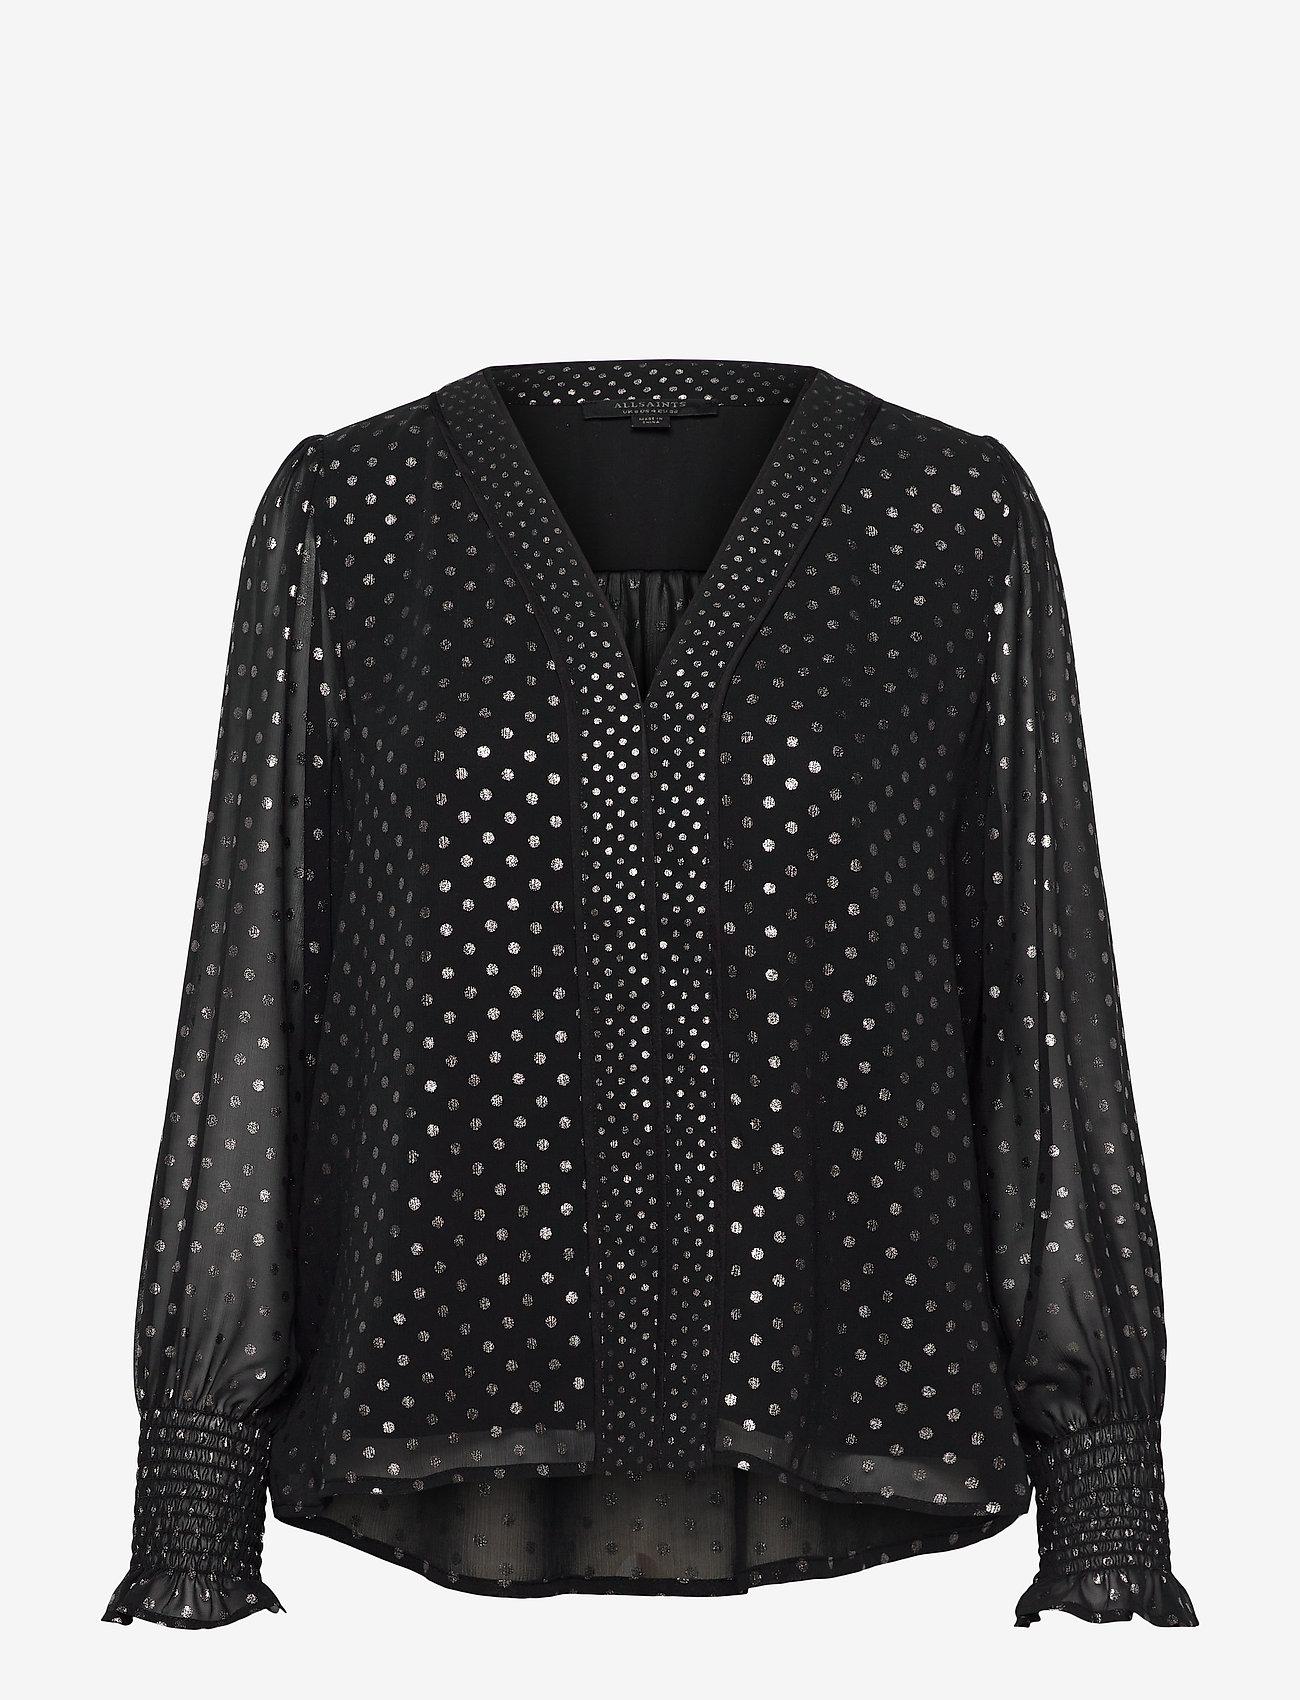 AllSaints - TENAYA DOT TOP - blouses à manches longues - black - 0